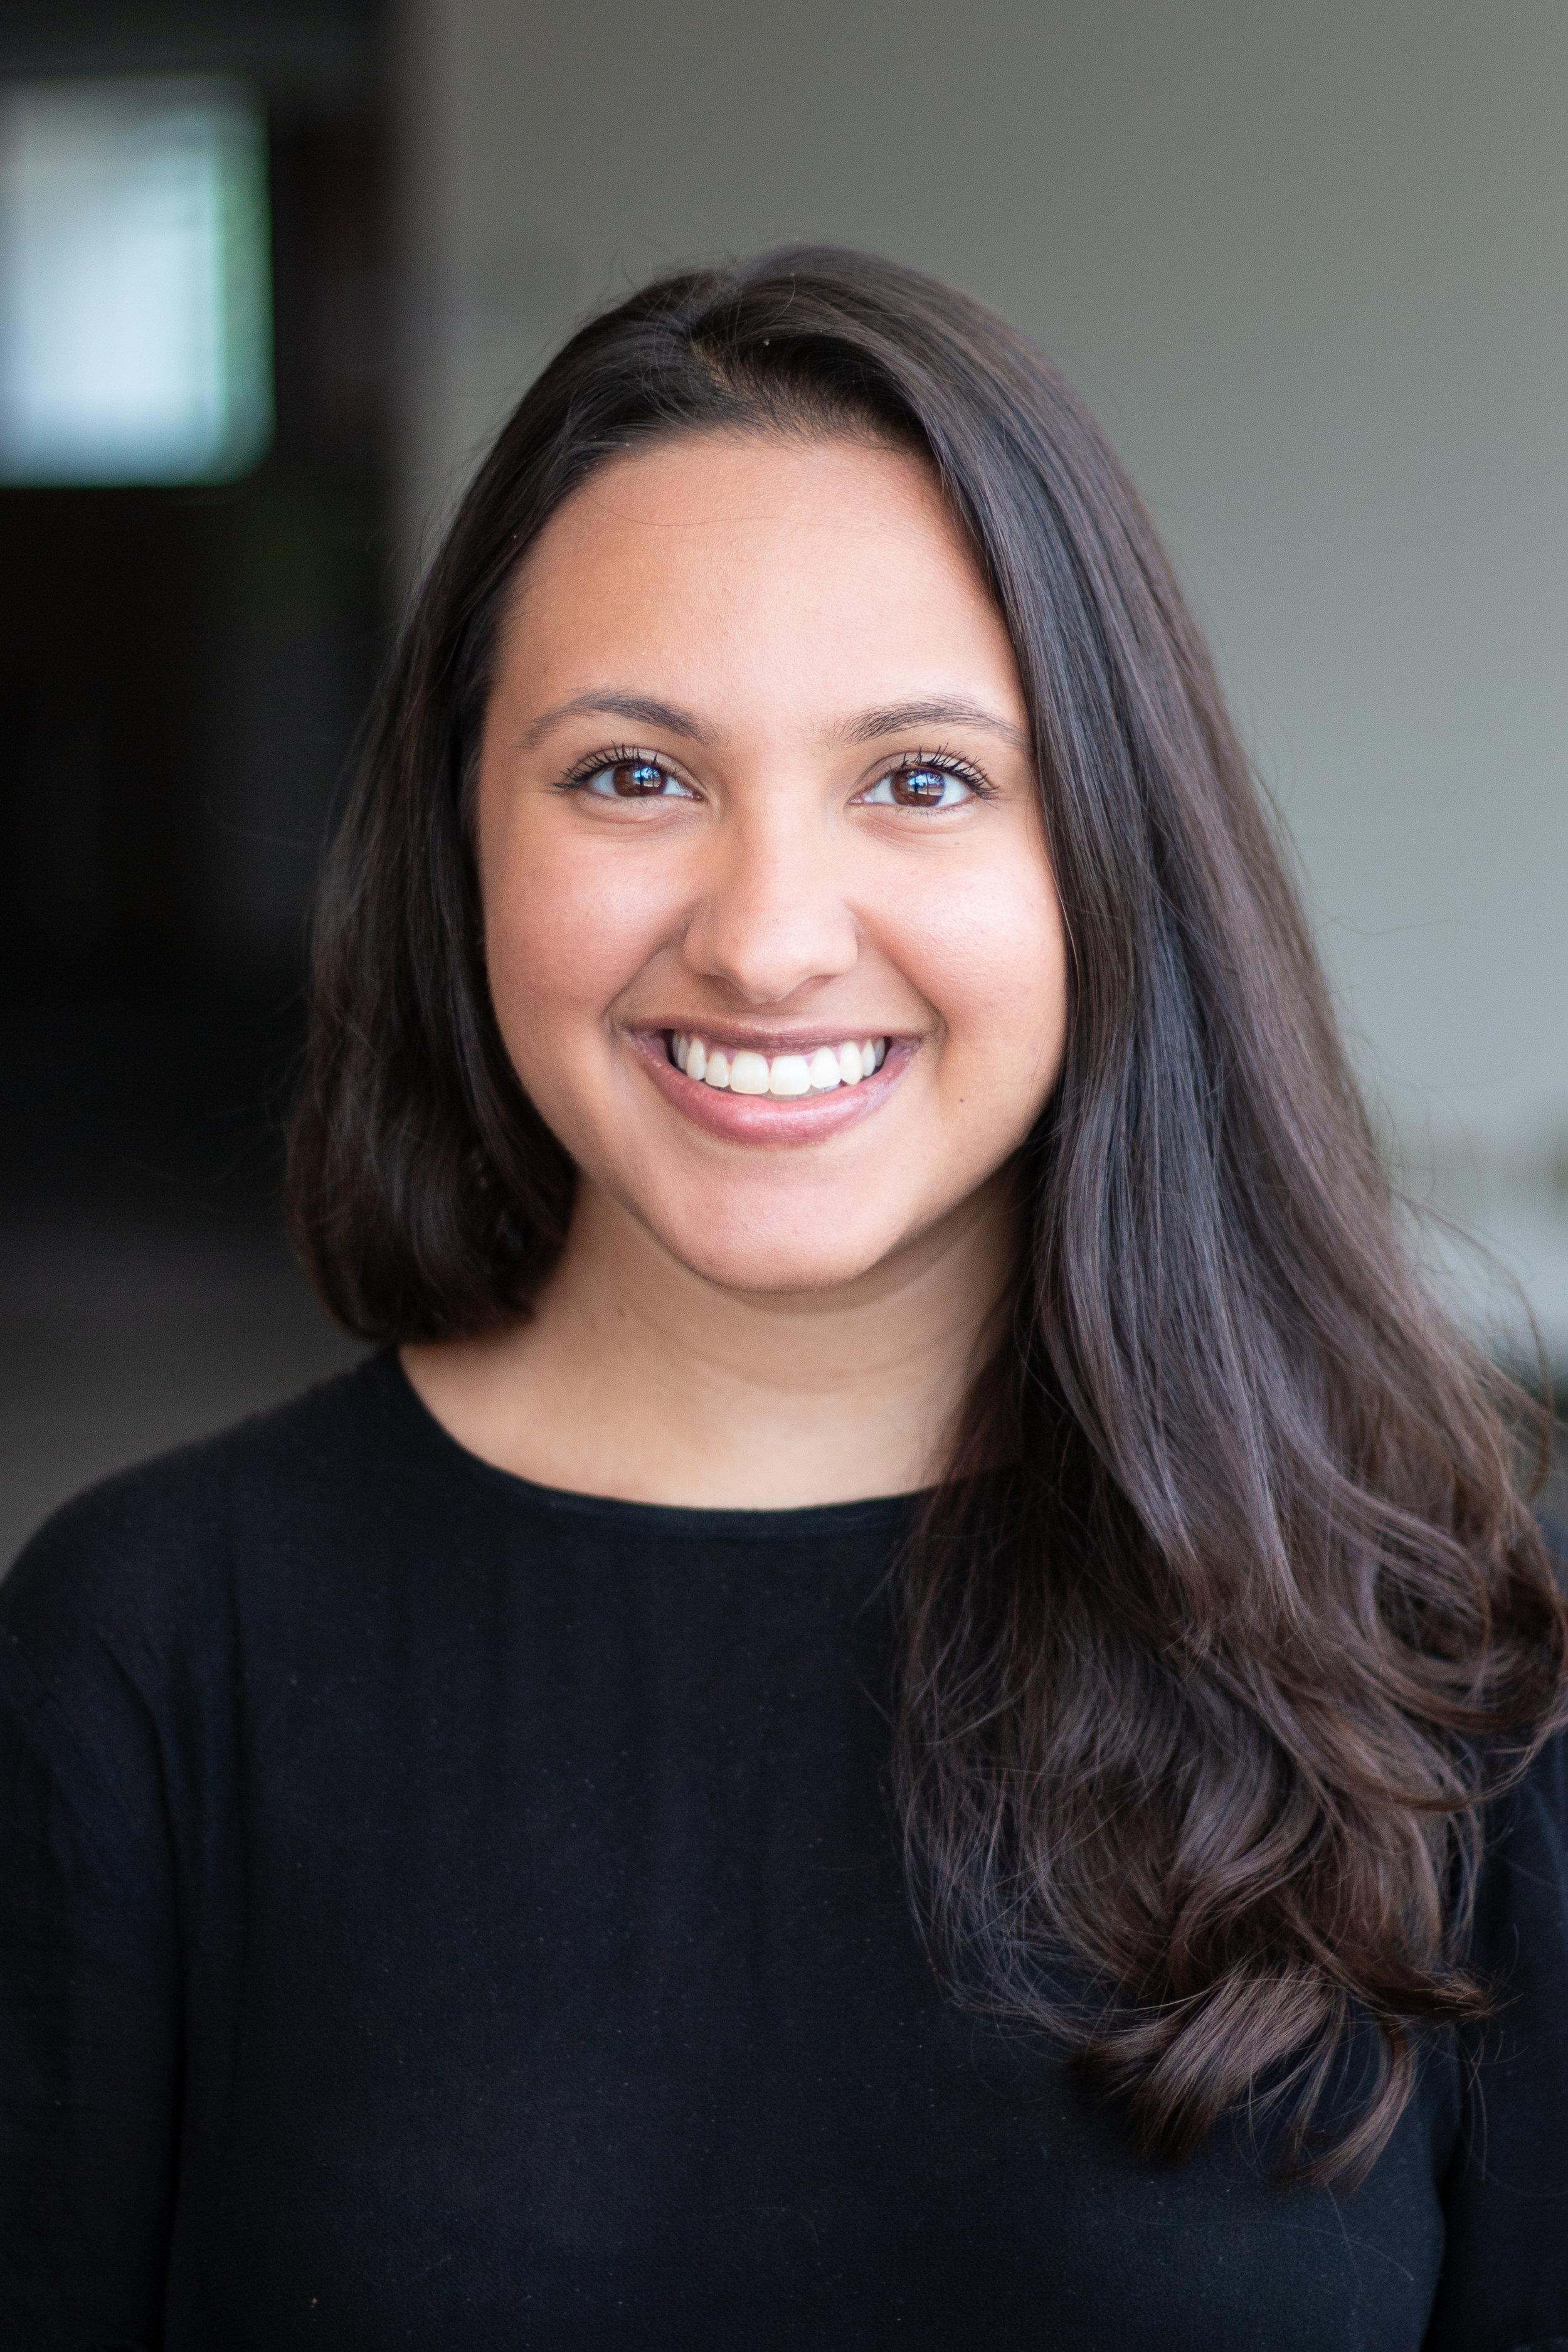 Priya Fremerman - Executive Directorpriya@globemed.org